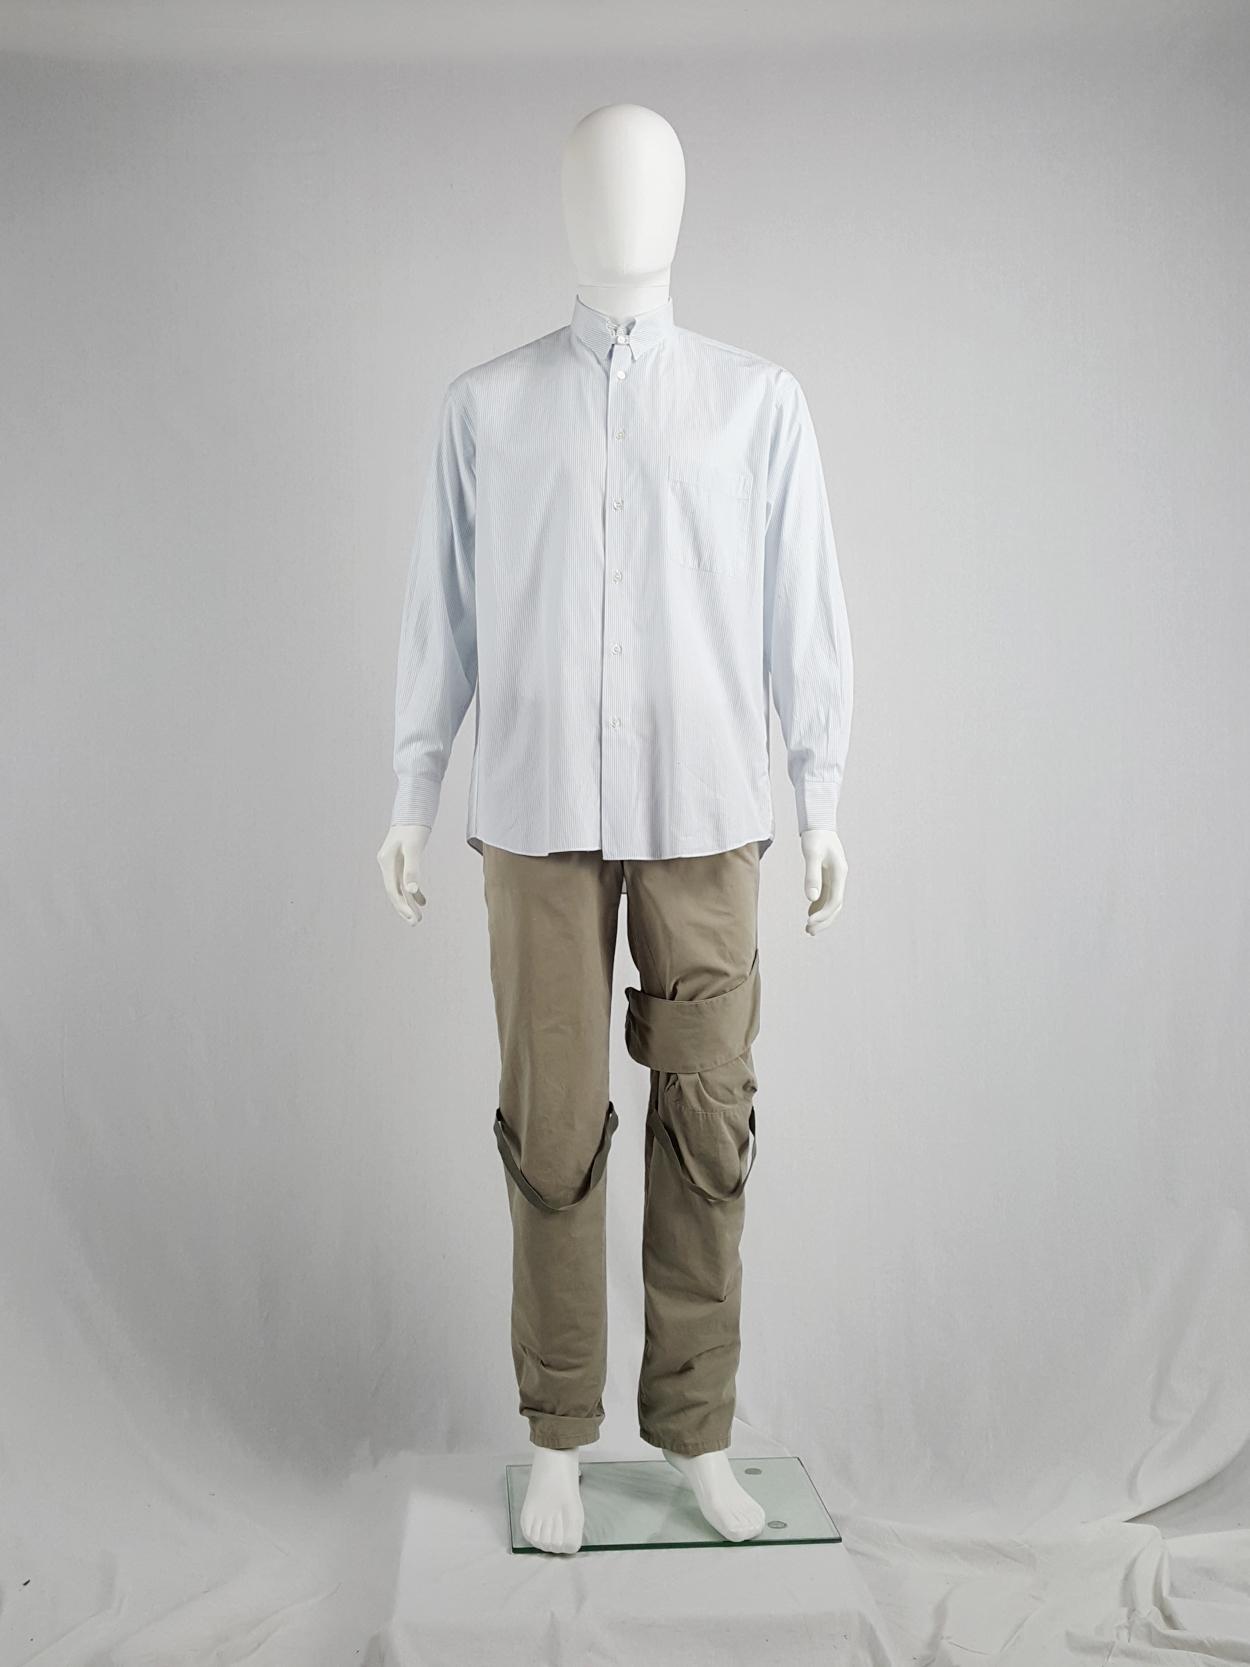 Tokio Kumagaï white and blue striped shirt with collar strap